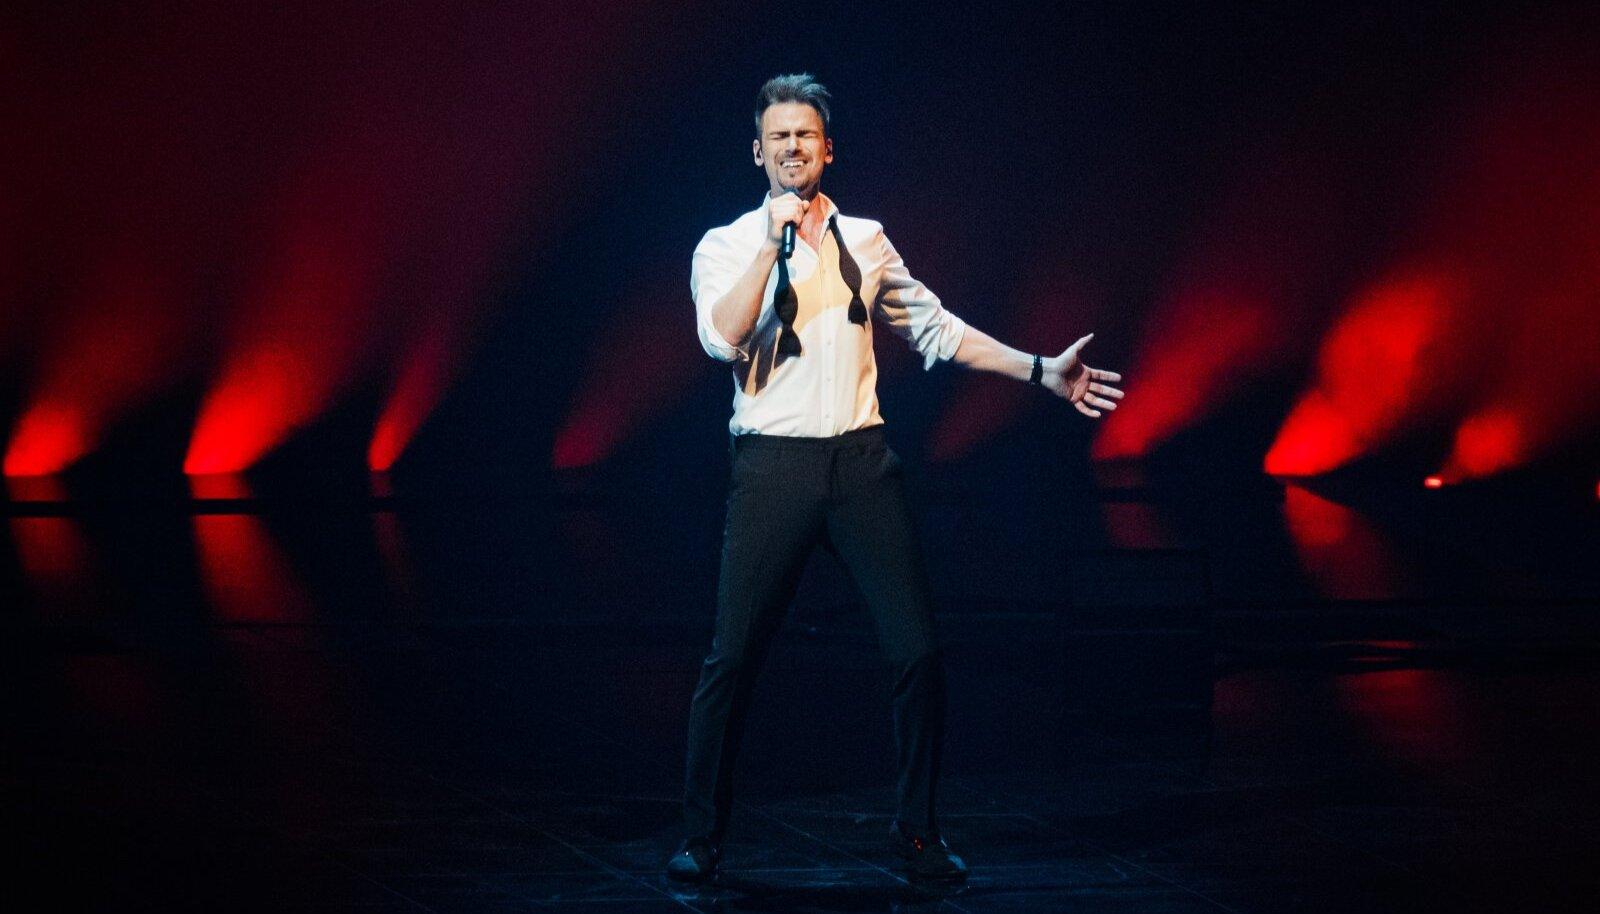 Eurvisioon, eurovision 2021 Rotterdam.